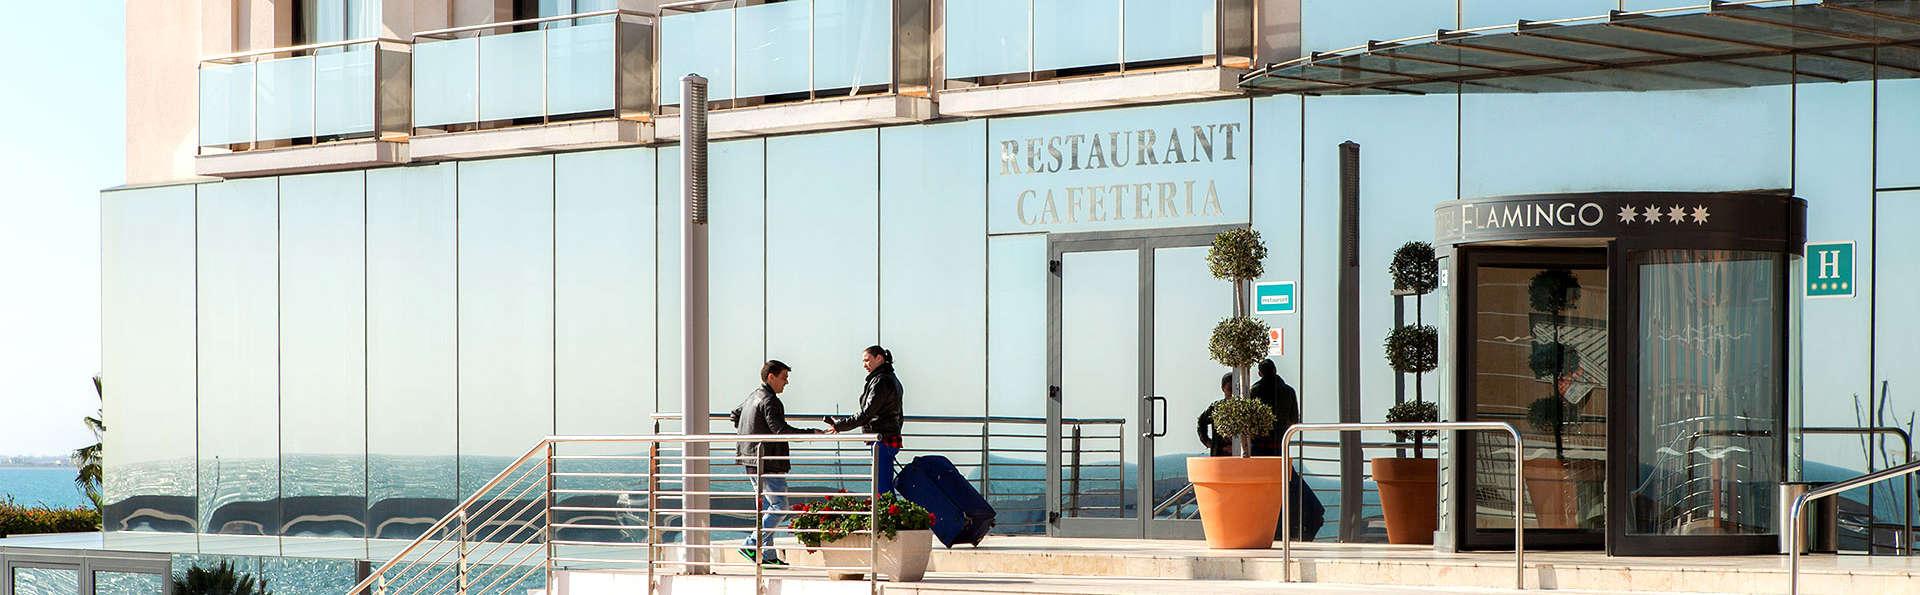 Hotel Flamingo - EDIT_NEW2_FRONT2.jpg